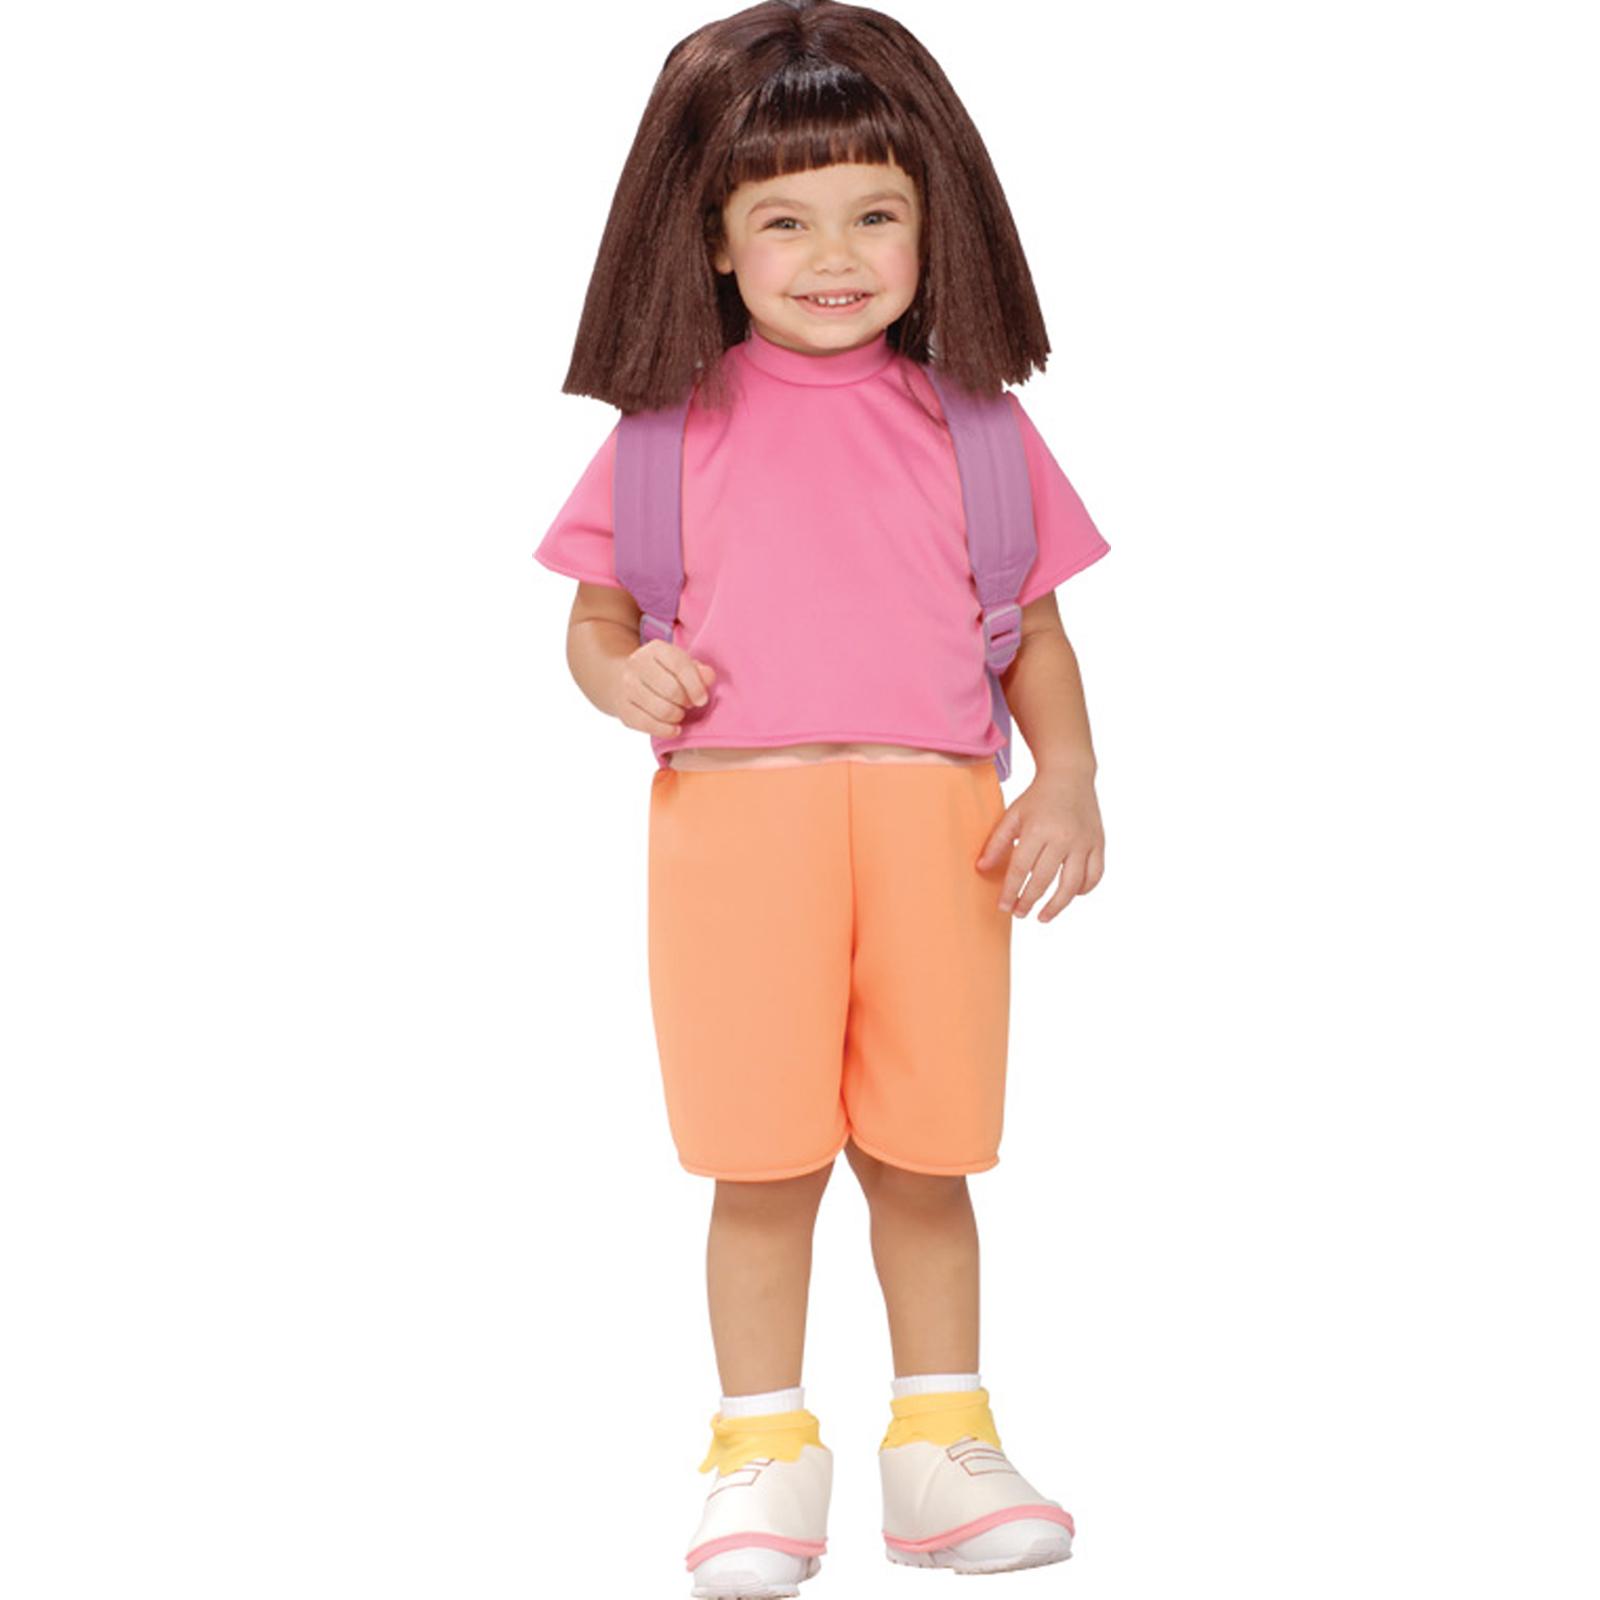 Dora The Explorer Halloween Sensations Dora Child Costume ...